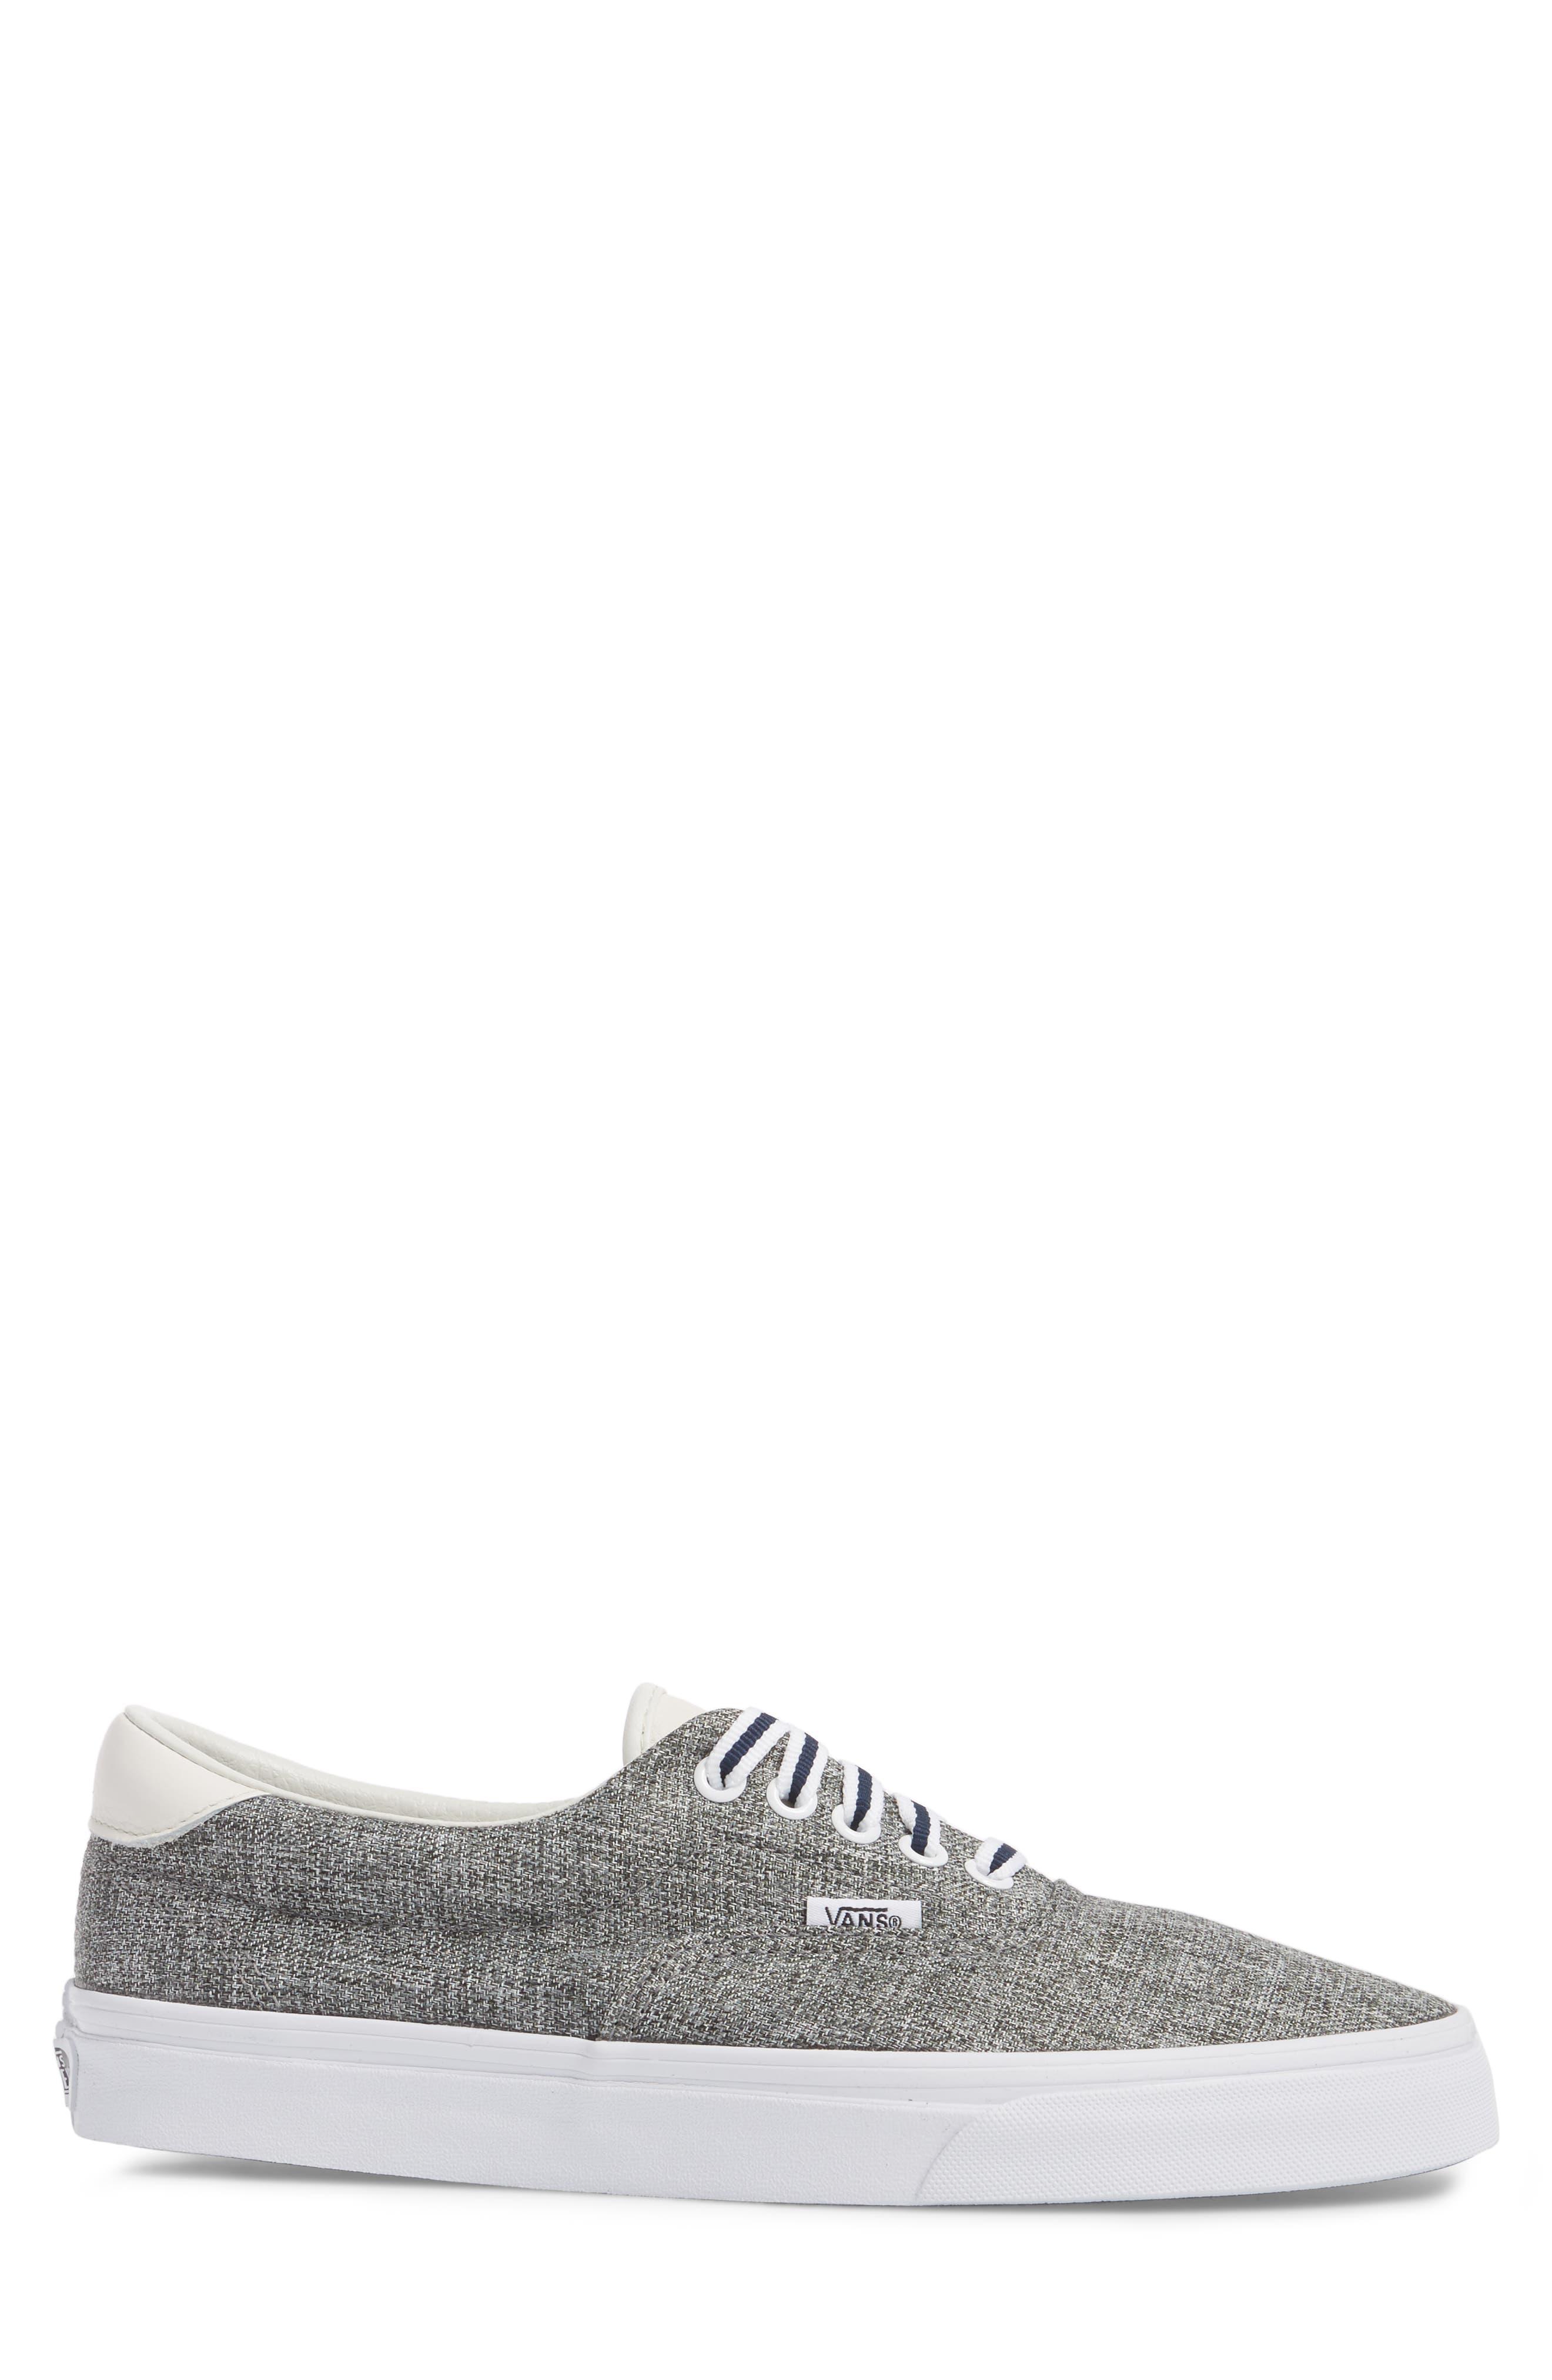 'Era 59' Sneaker,                             Alternate thumbnail 3, color,                             022